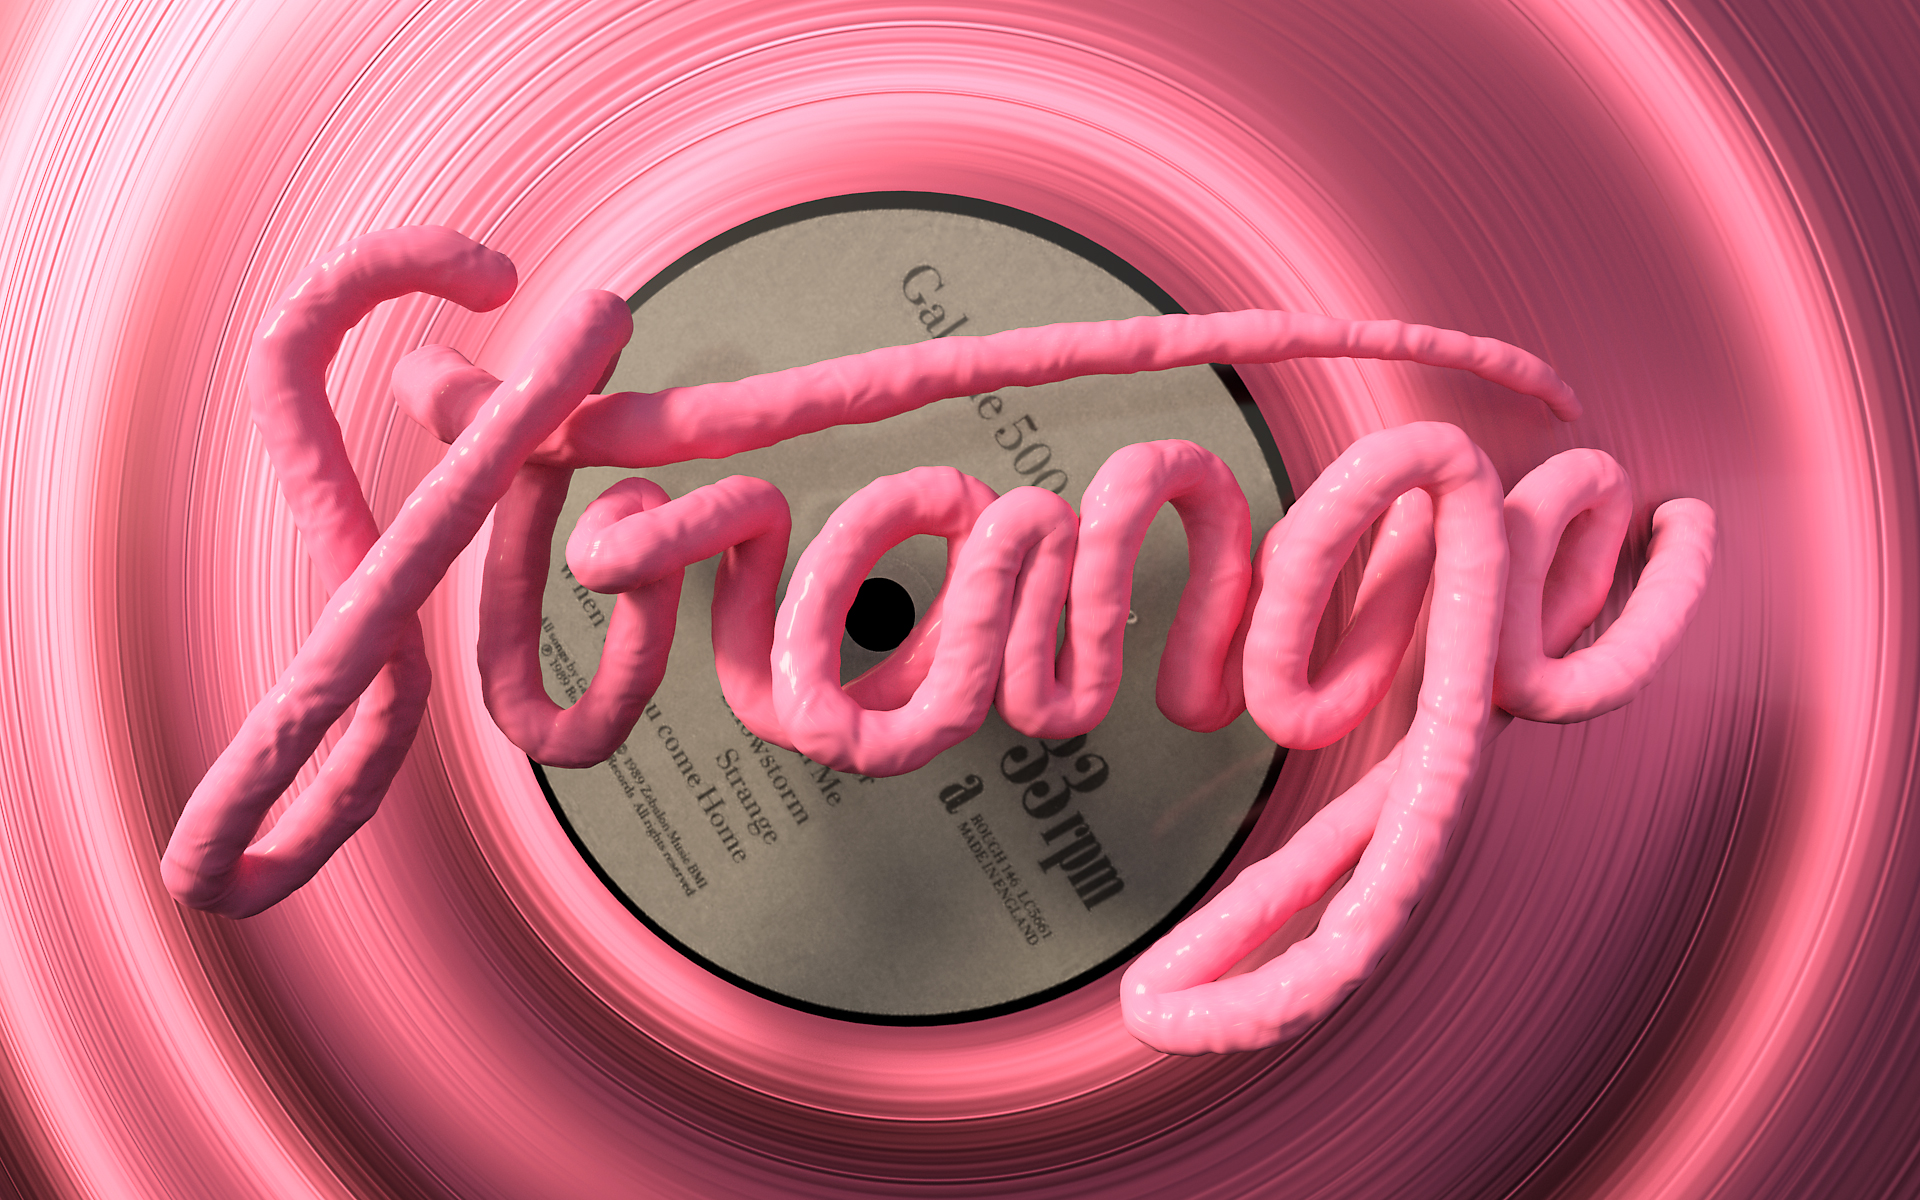 Strange_Galaxie_500_ivan_ardura